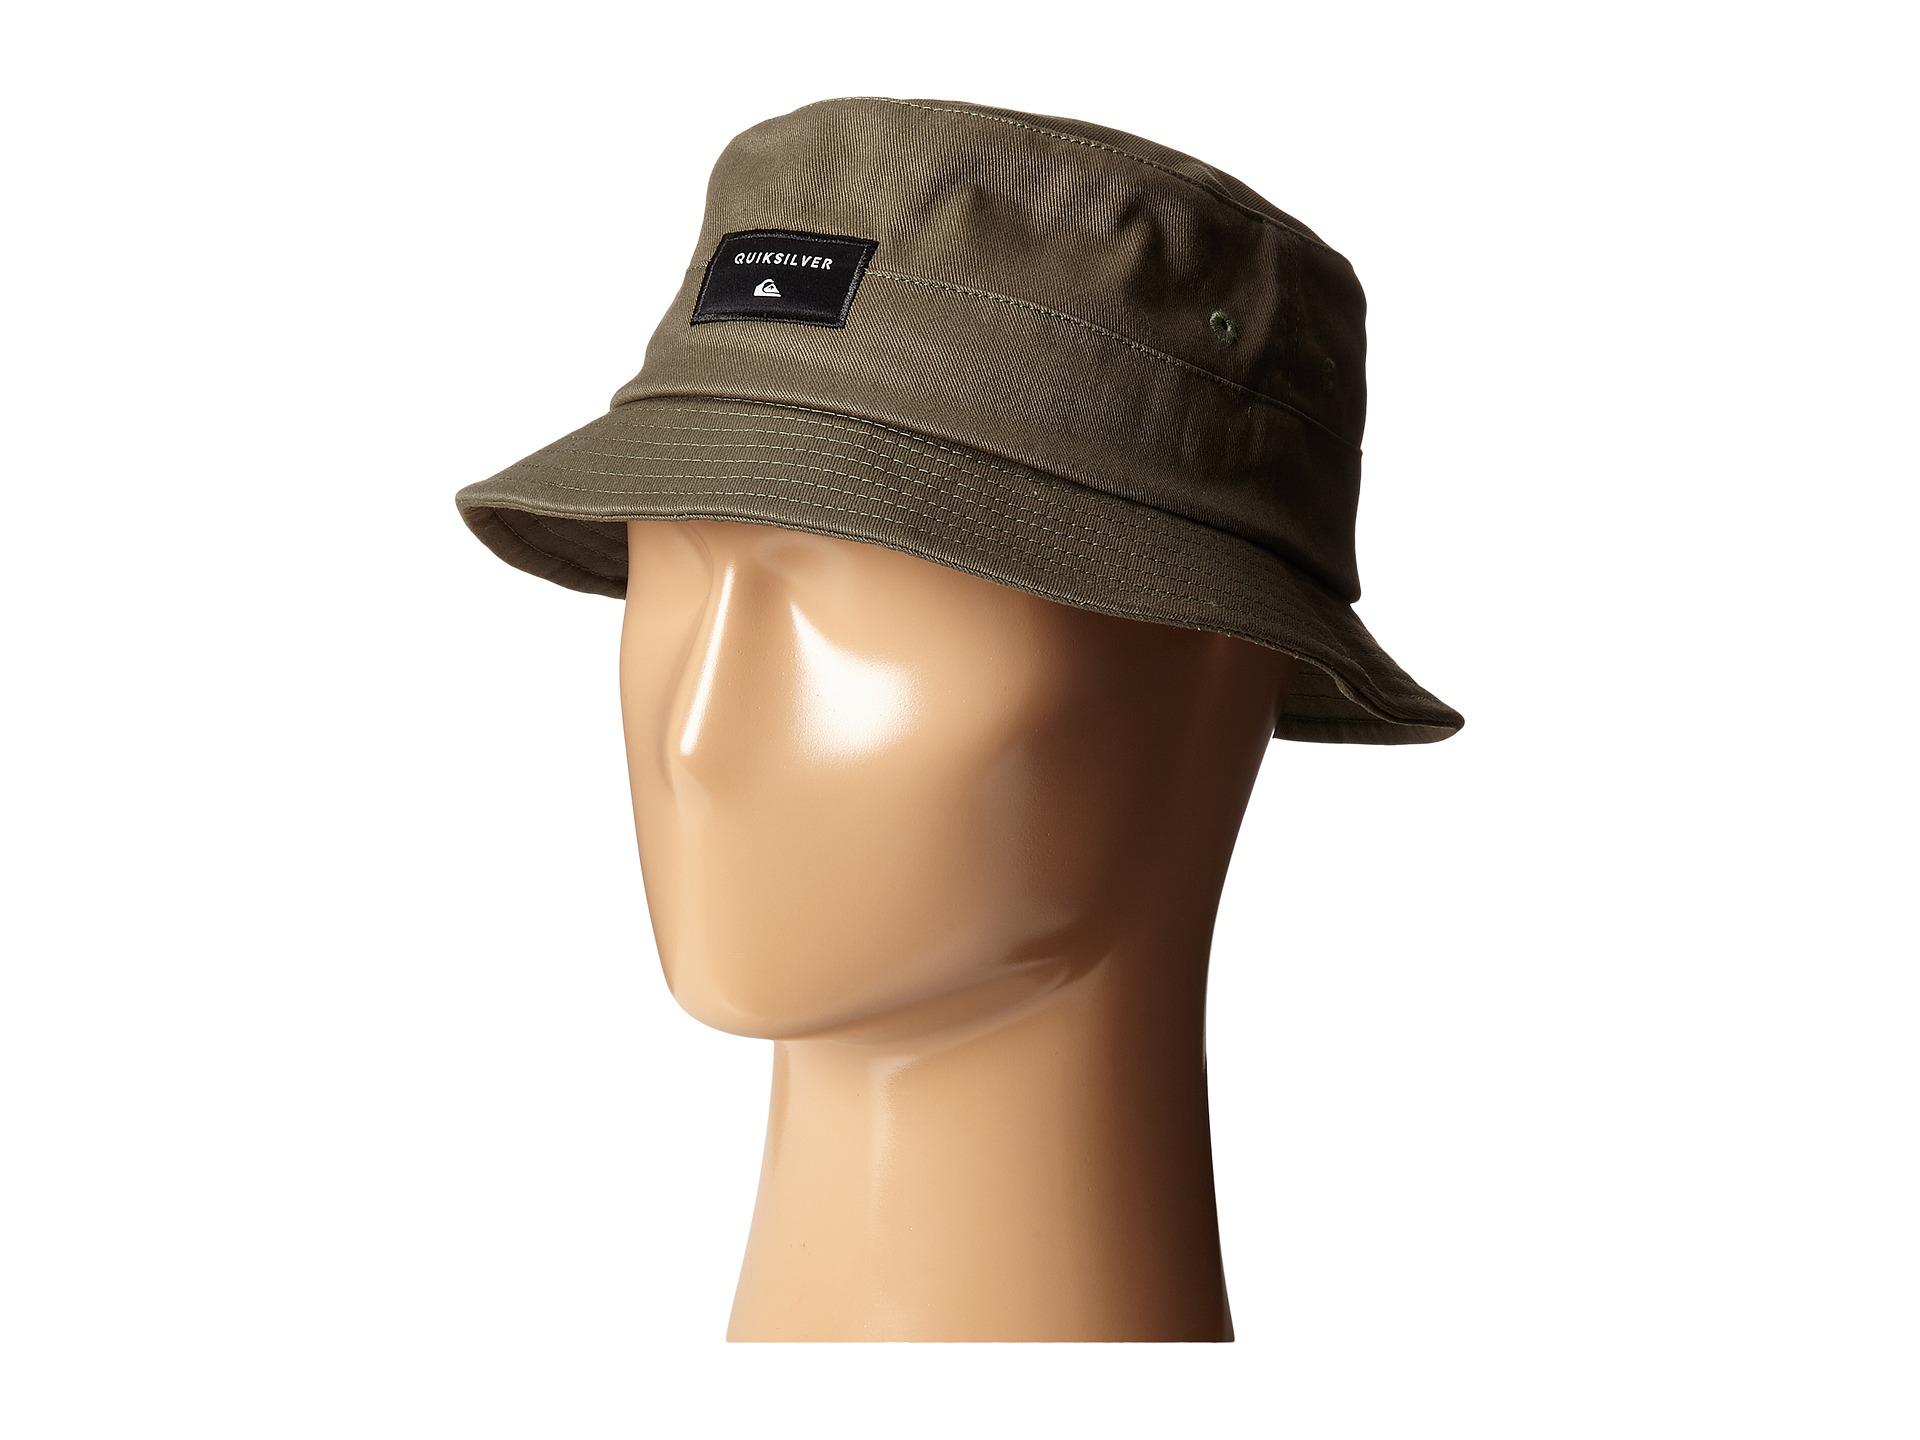 8e620ed47e8a2 ... wholesale lyst quiksilver stuckit bucket hat for men fa1e7 ecaa7